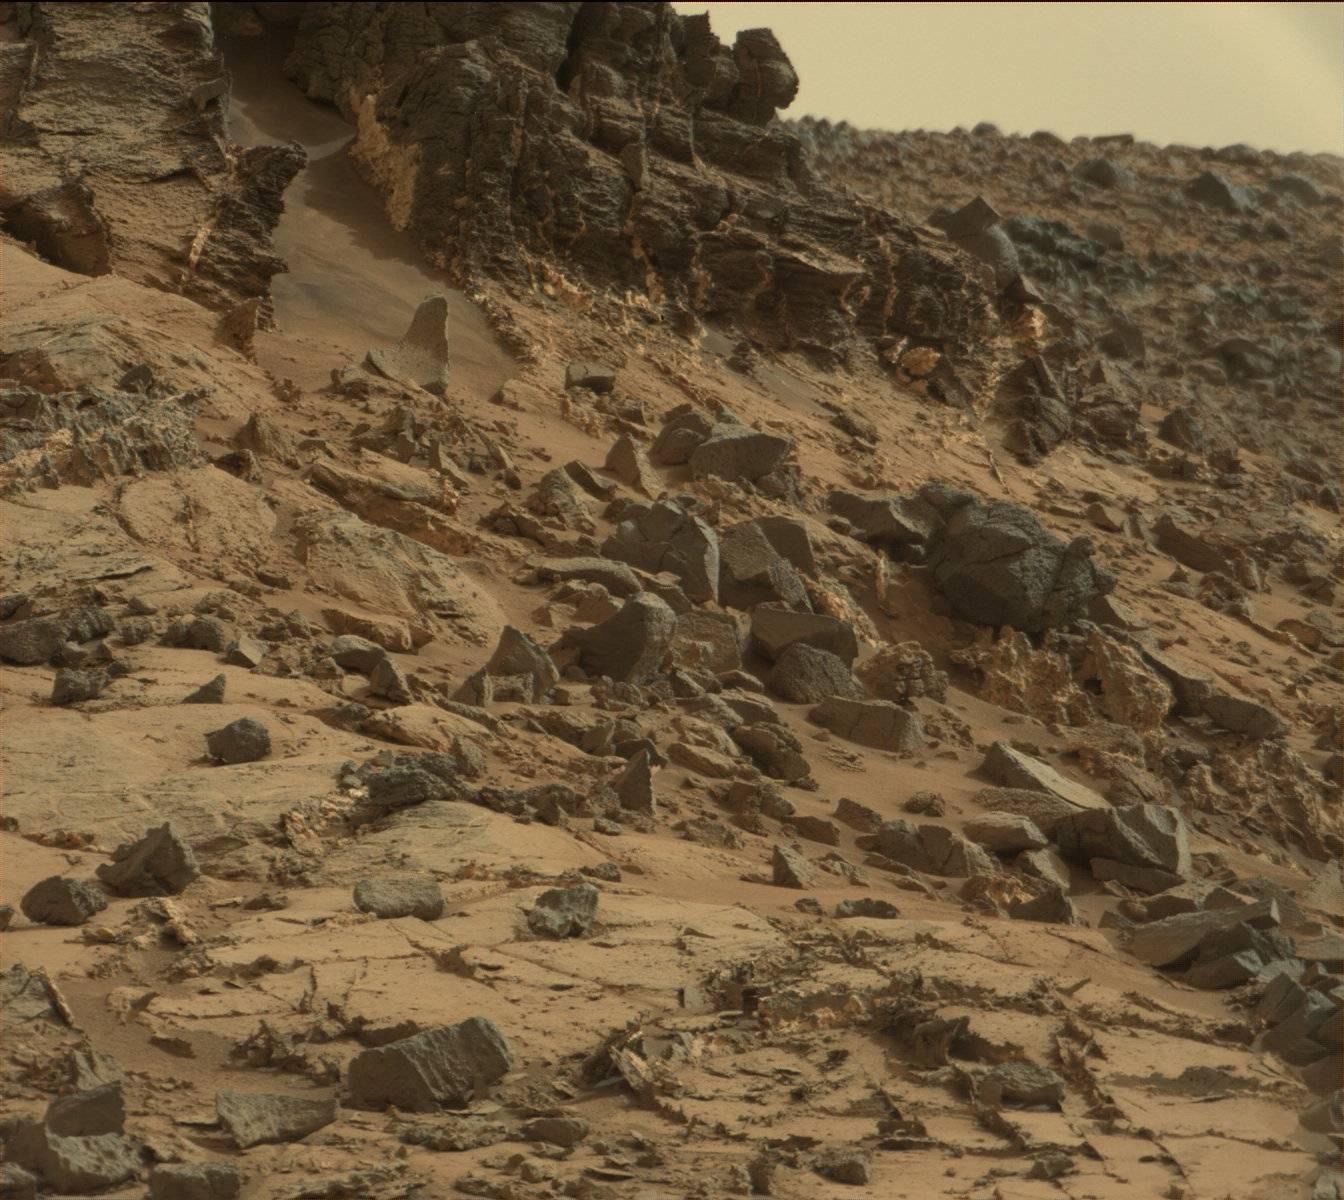 report on mars nasa - photo #17